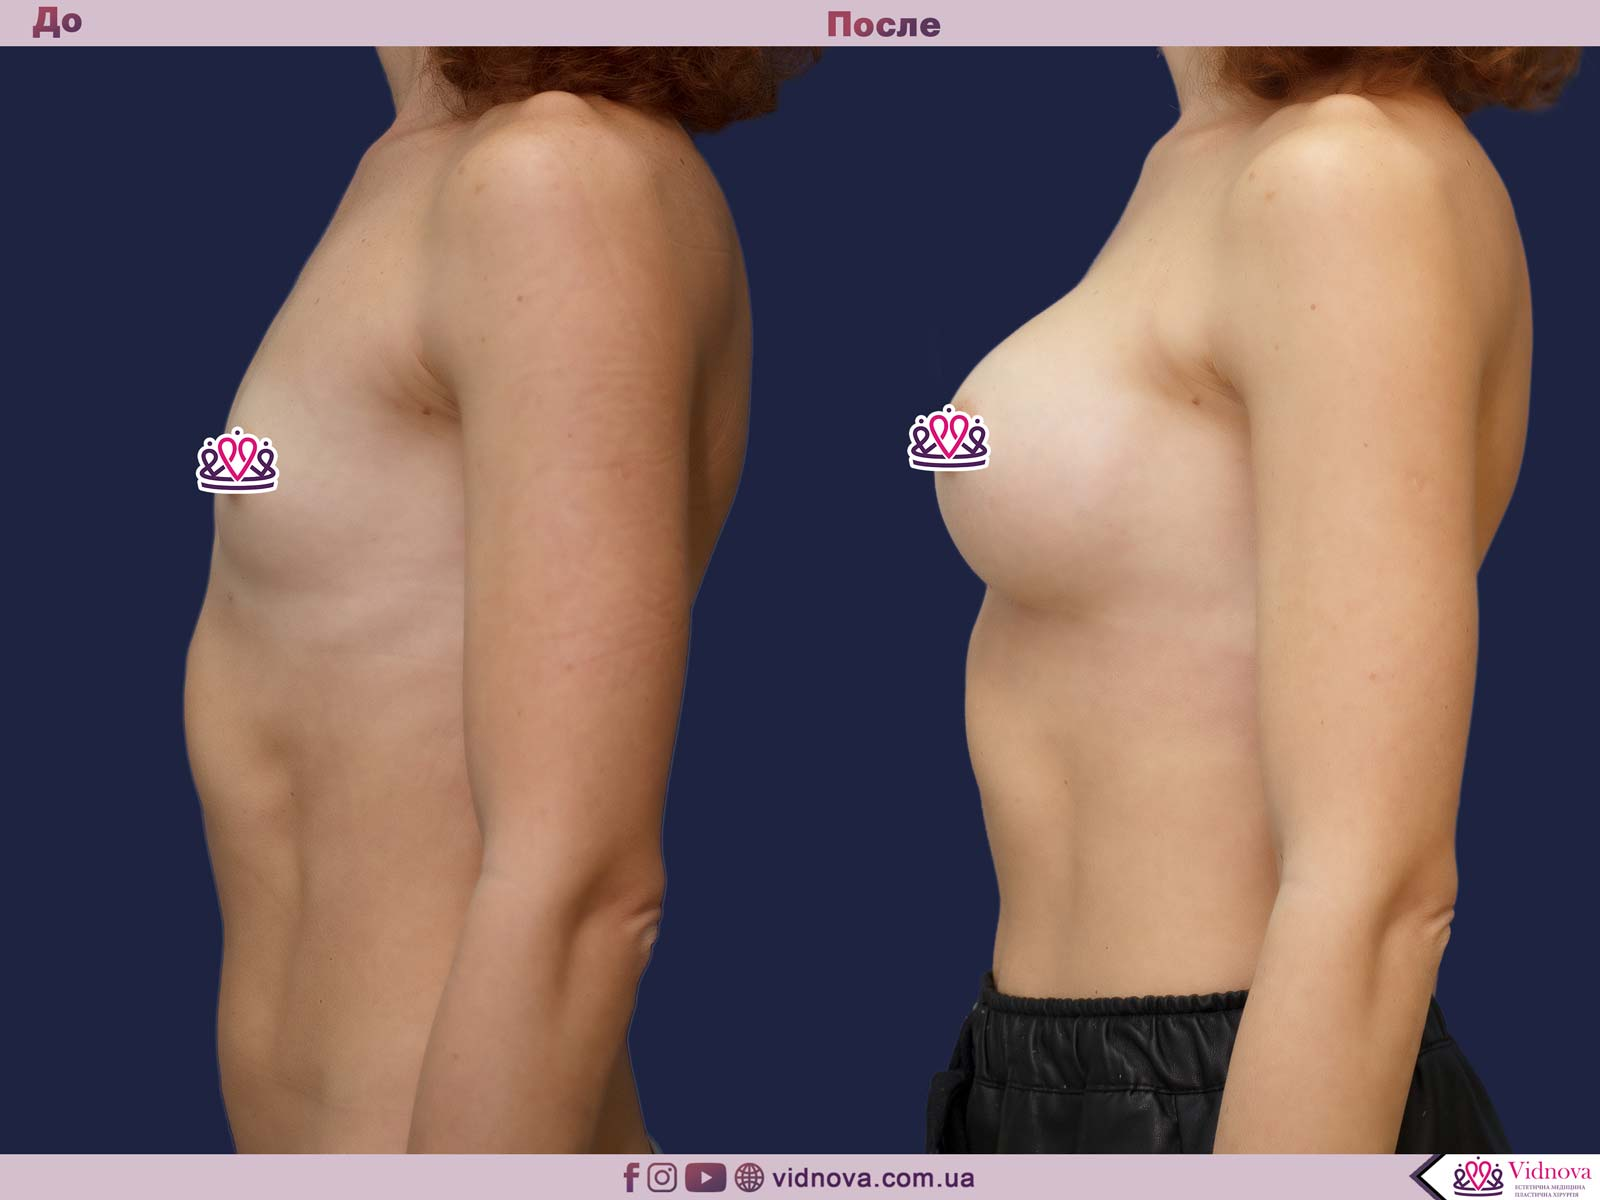 Увеличение груди: Фото ДО и ПОСЛЕ - Пример №70-3 - Клиника Vidnova